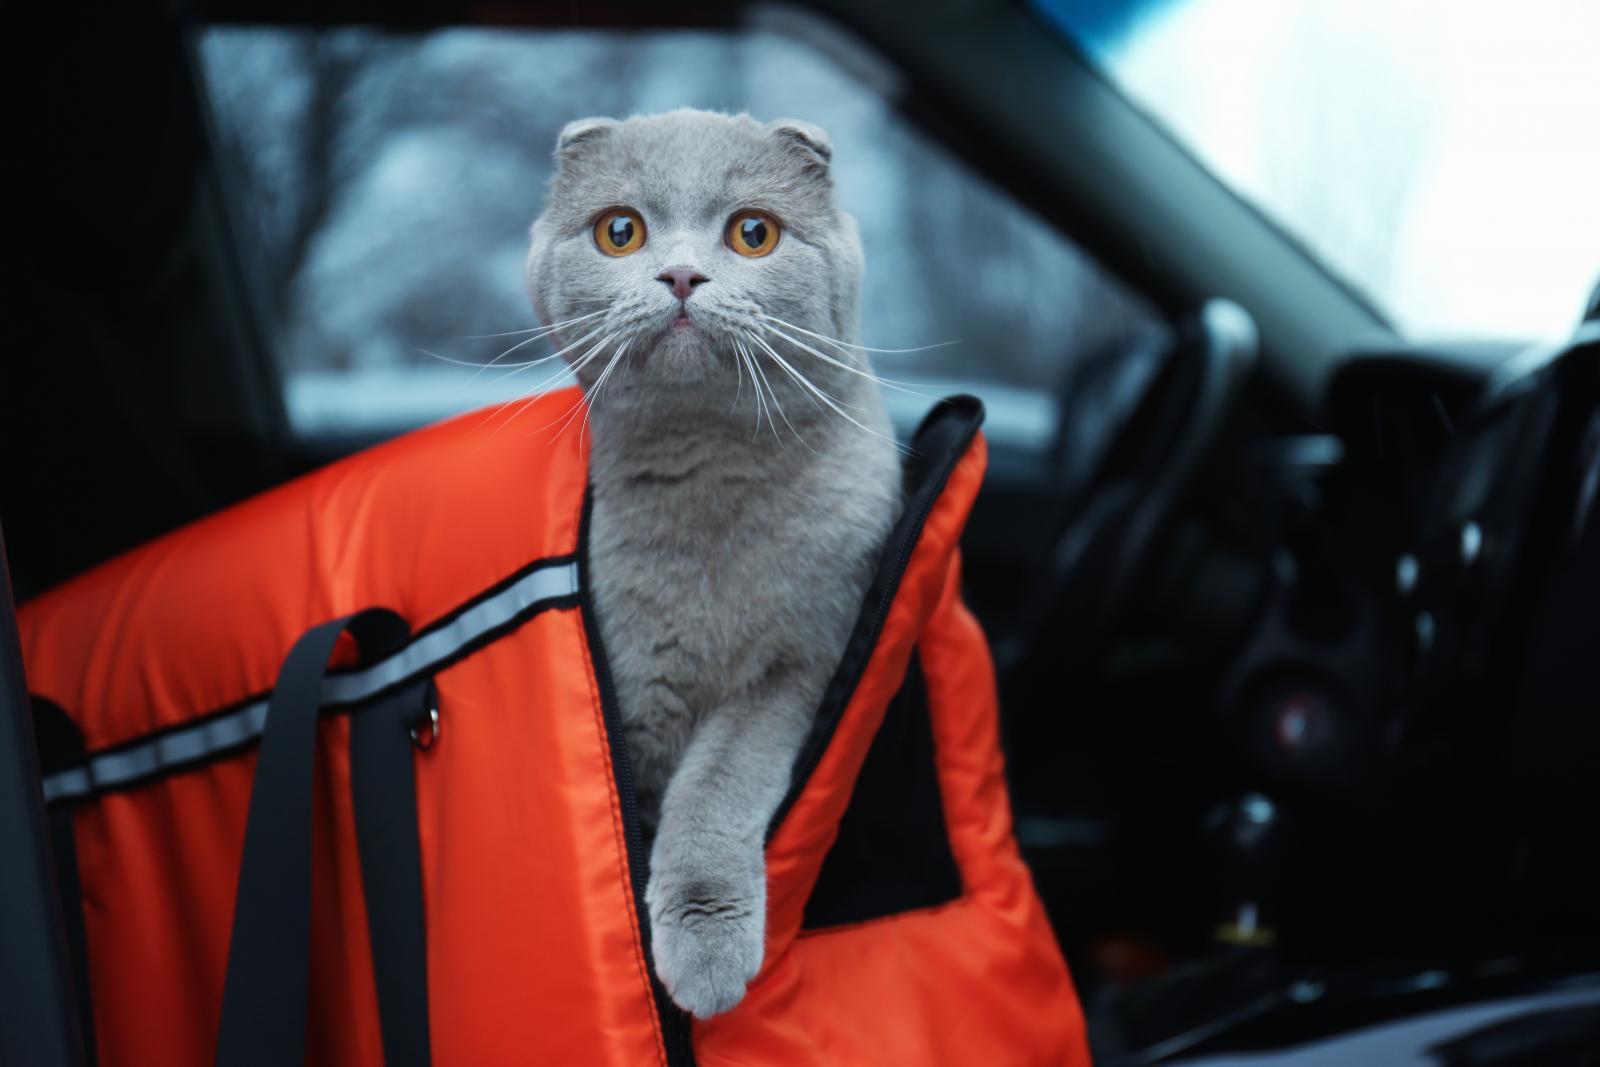 voyage chat voiture dangers